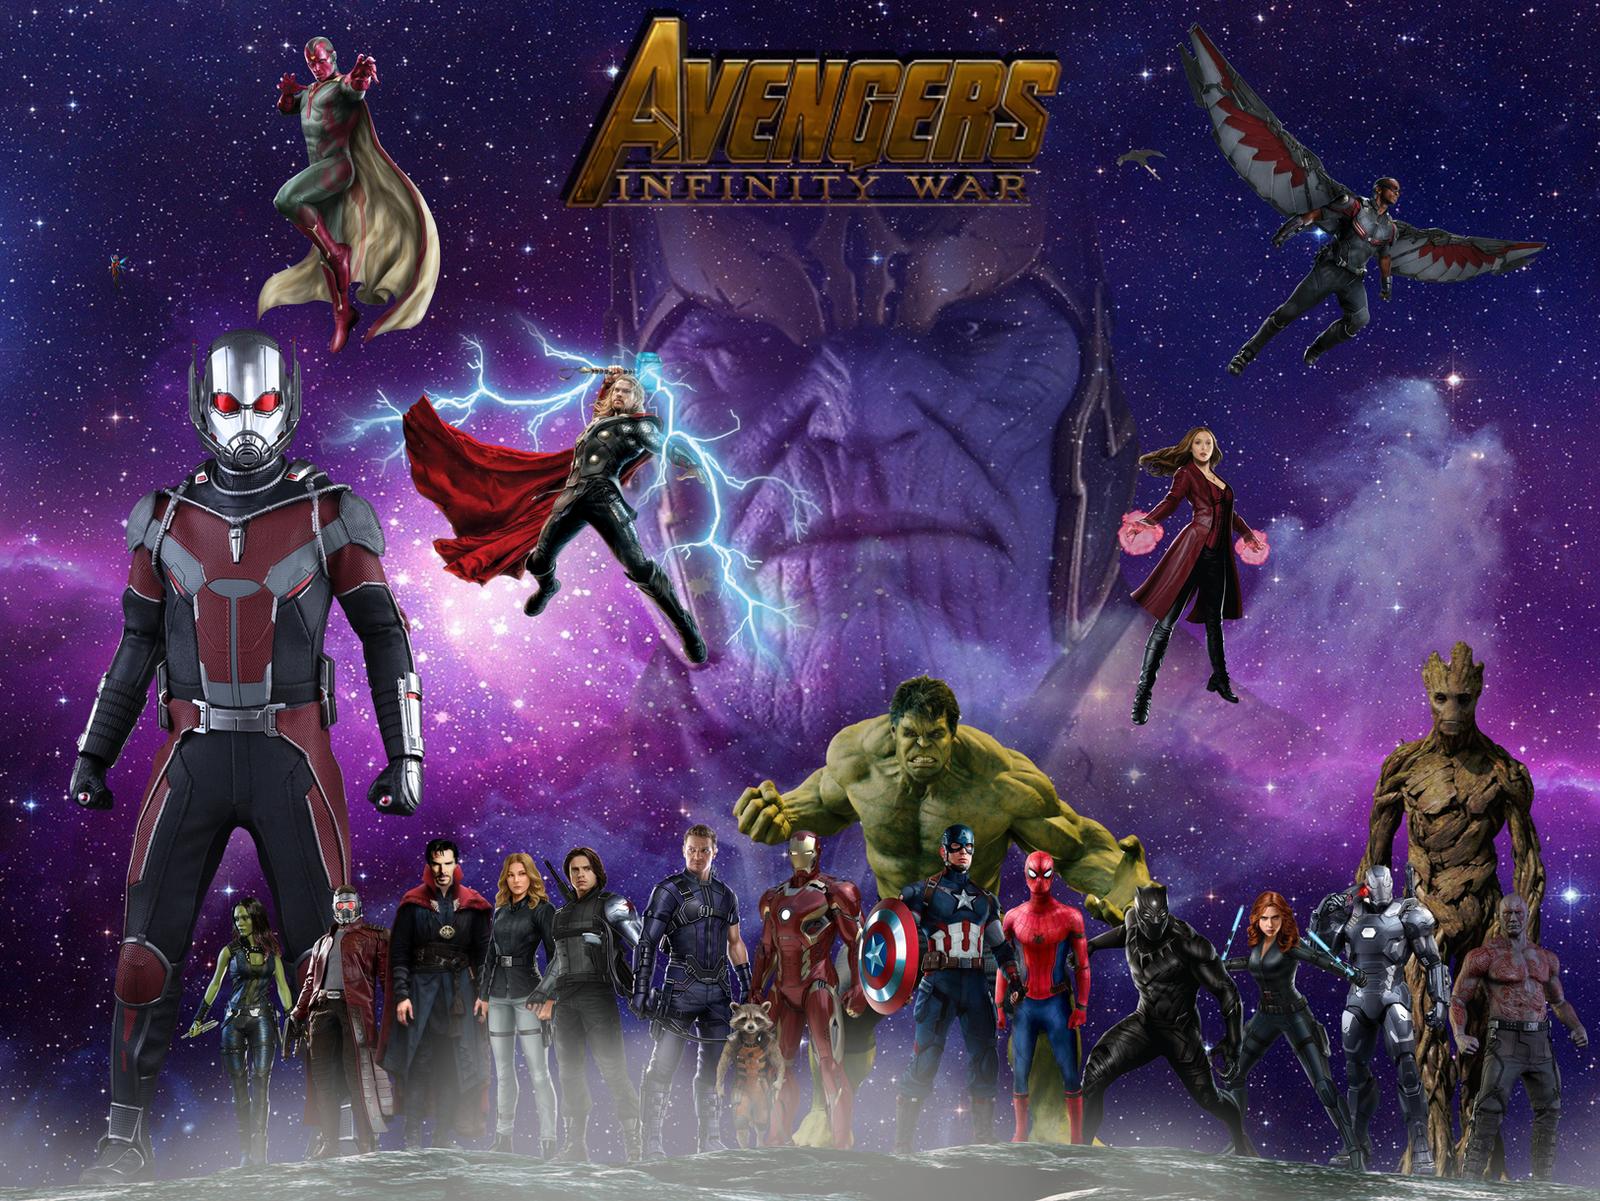 Good Wallpaper Marvel Deviantart - avengers_infinity_war_wallpaper_by_arkhamnatic-d9ygvon  Pic_132779.png